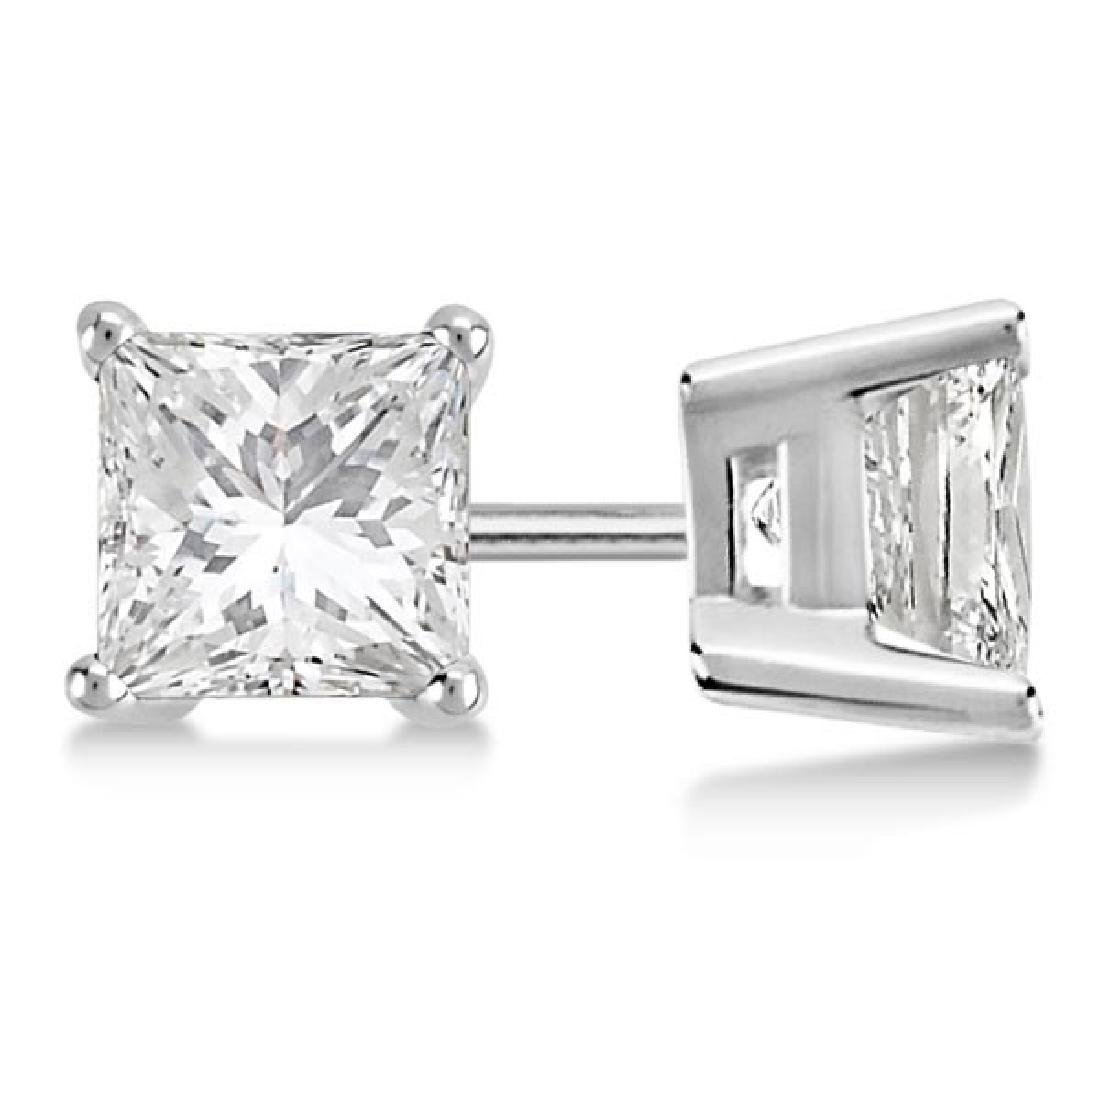 Certified 0.53 CTW Princess Diamond Stud Earrings D/SI3